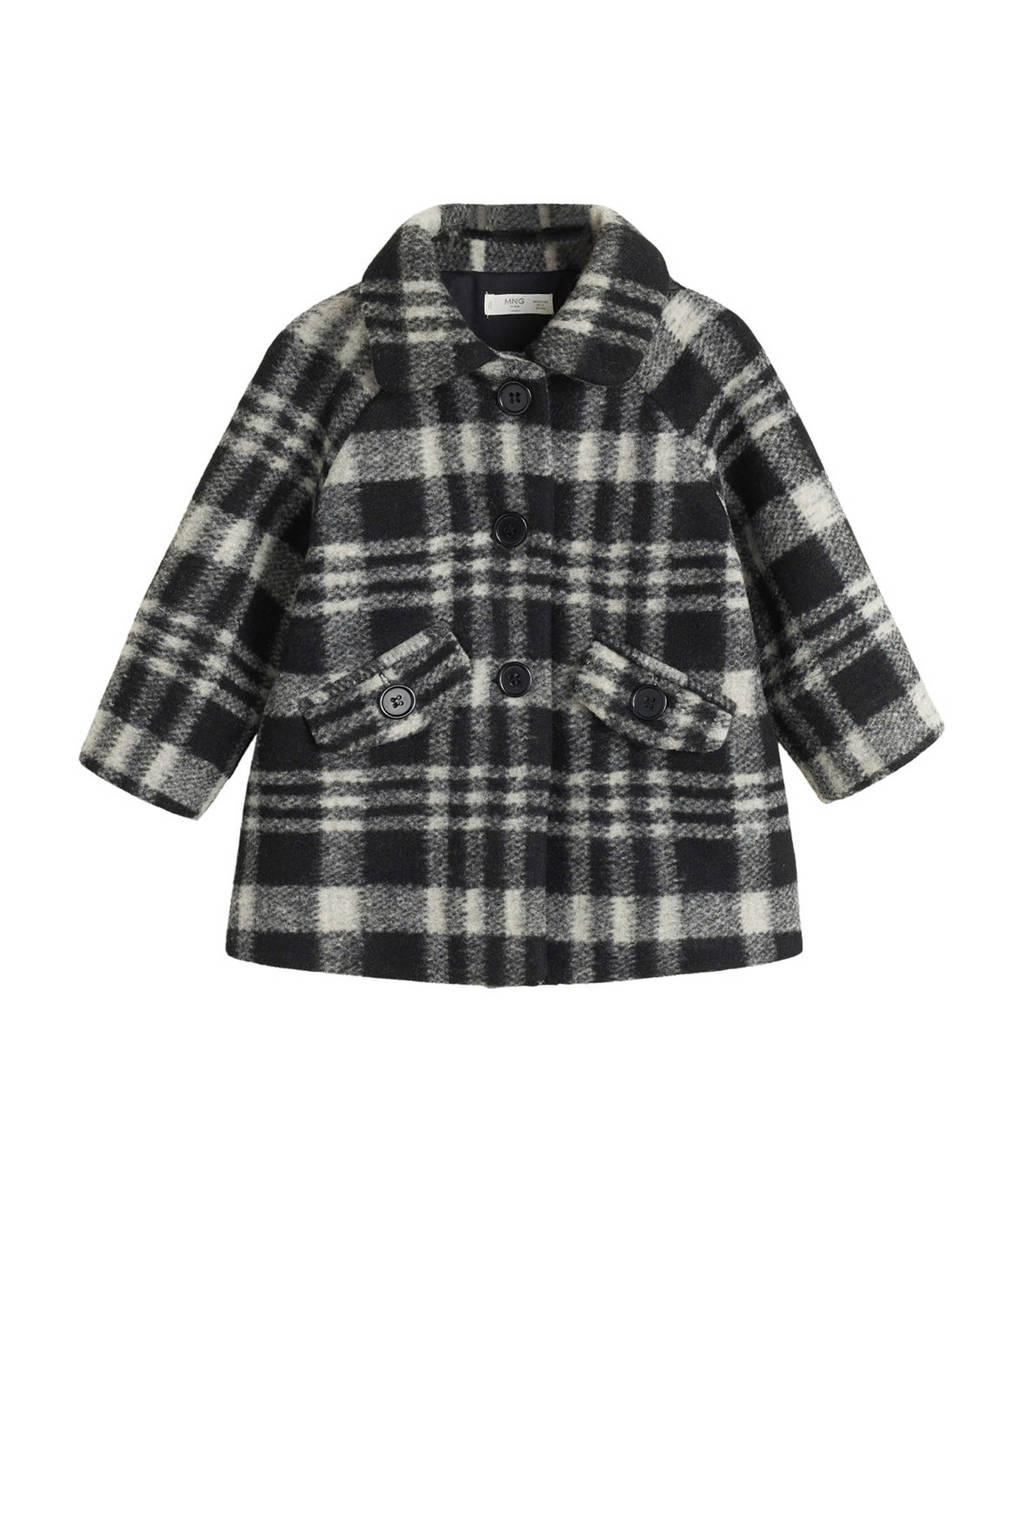 Mango Kids geruite winterjas zwart/wit, Zwart/wit